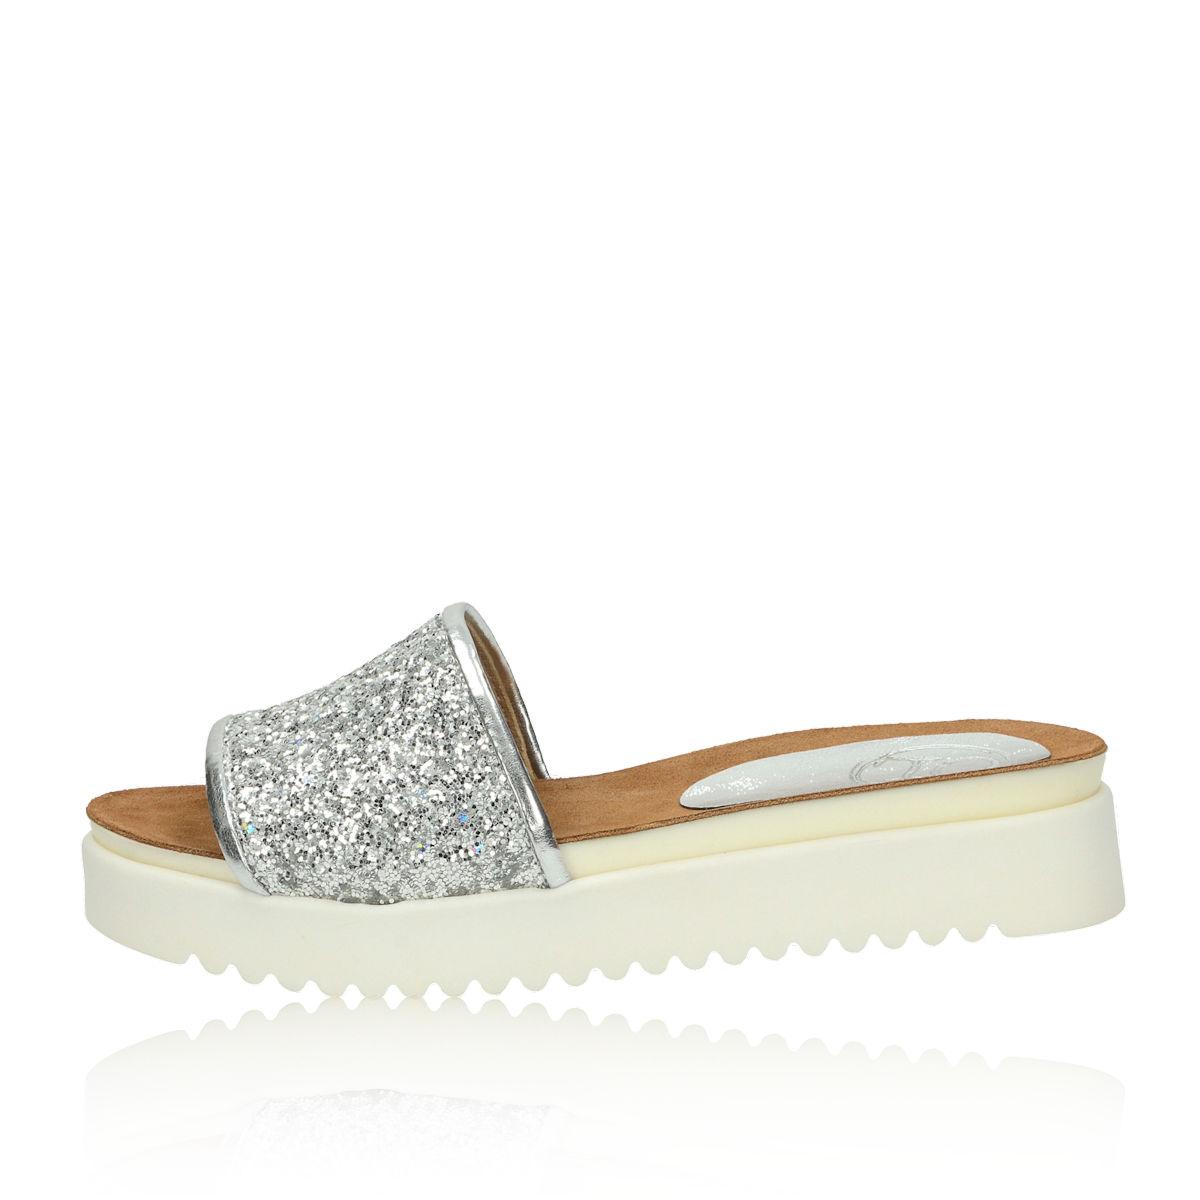 Olivia shoes dámske šľapky - strieborné Olivia shoes dámske šľapky -  strieborné ... 9eac1c8072a